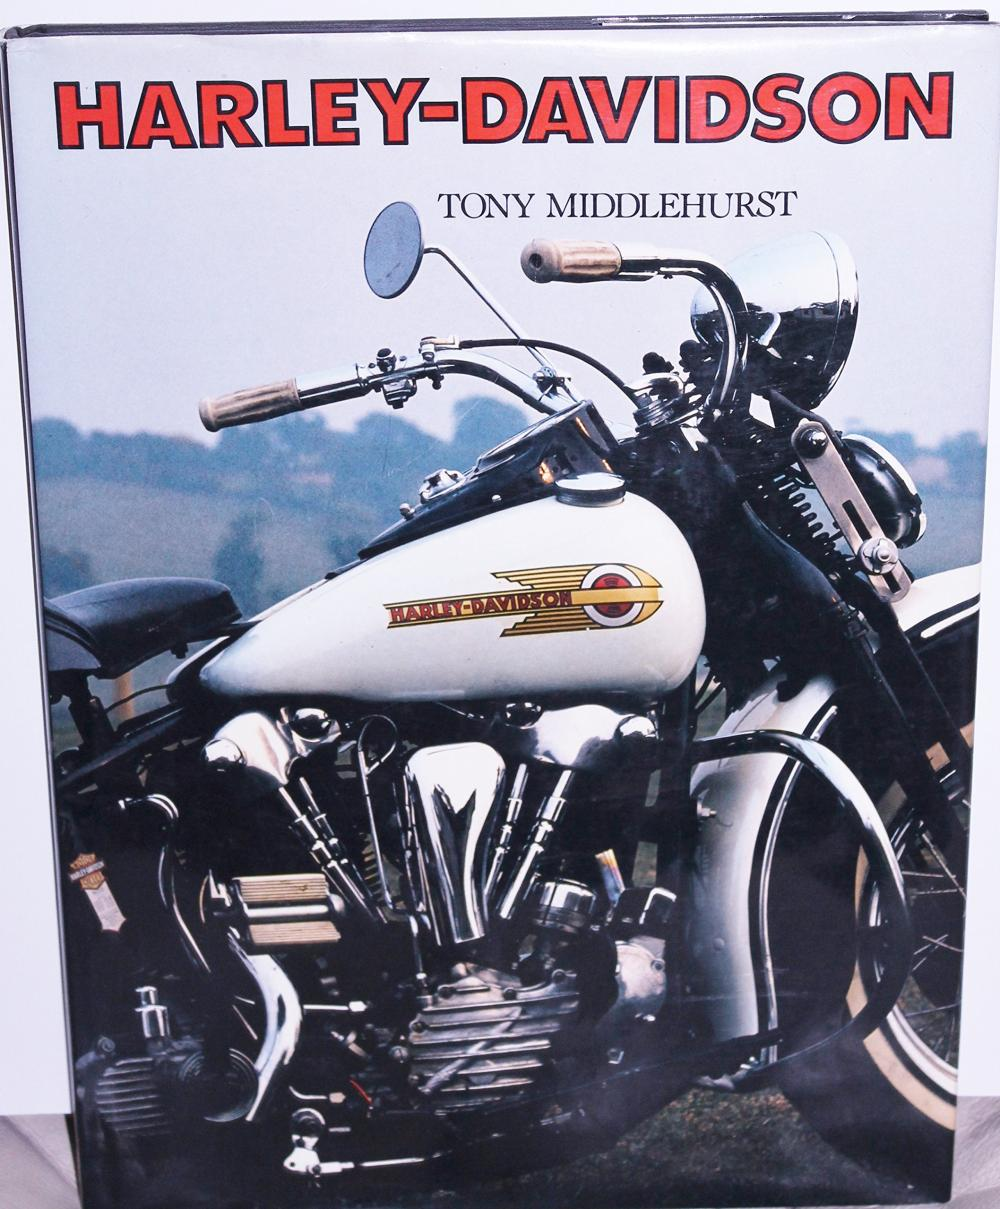 Lot 72: Harley-Davidson Hardcover – 1990 Tony Middlehurst